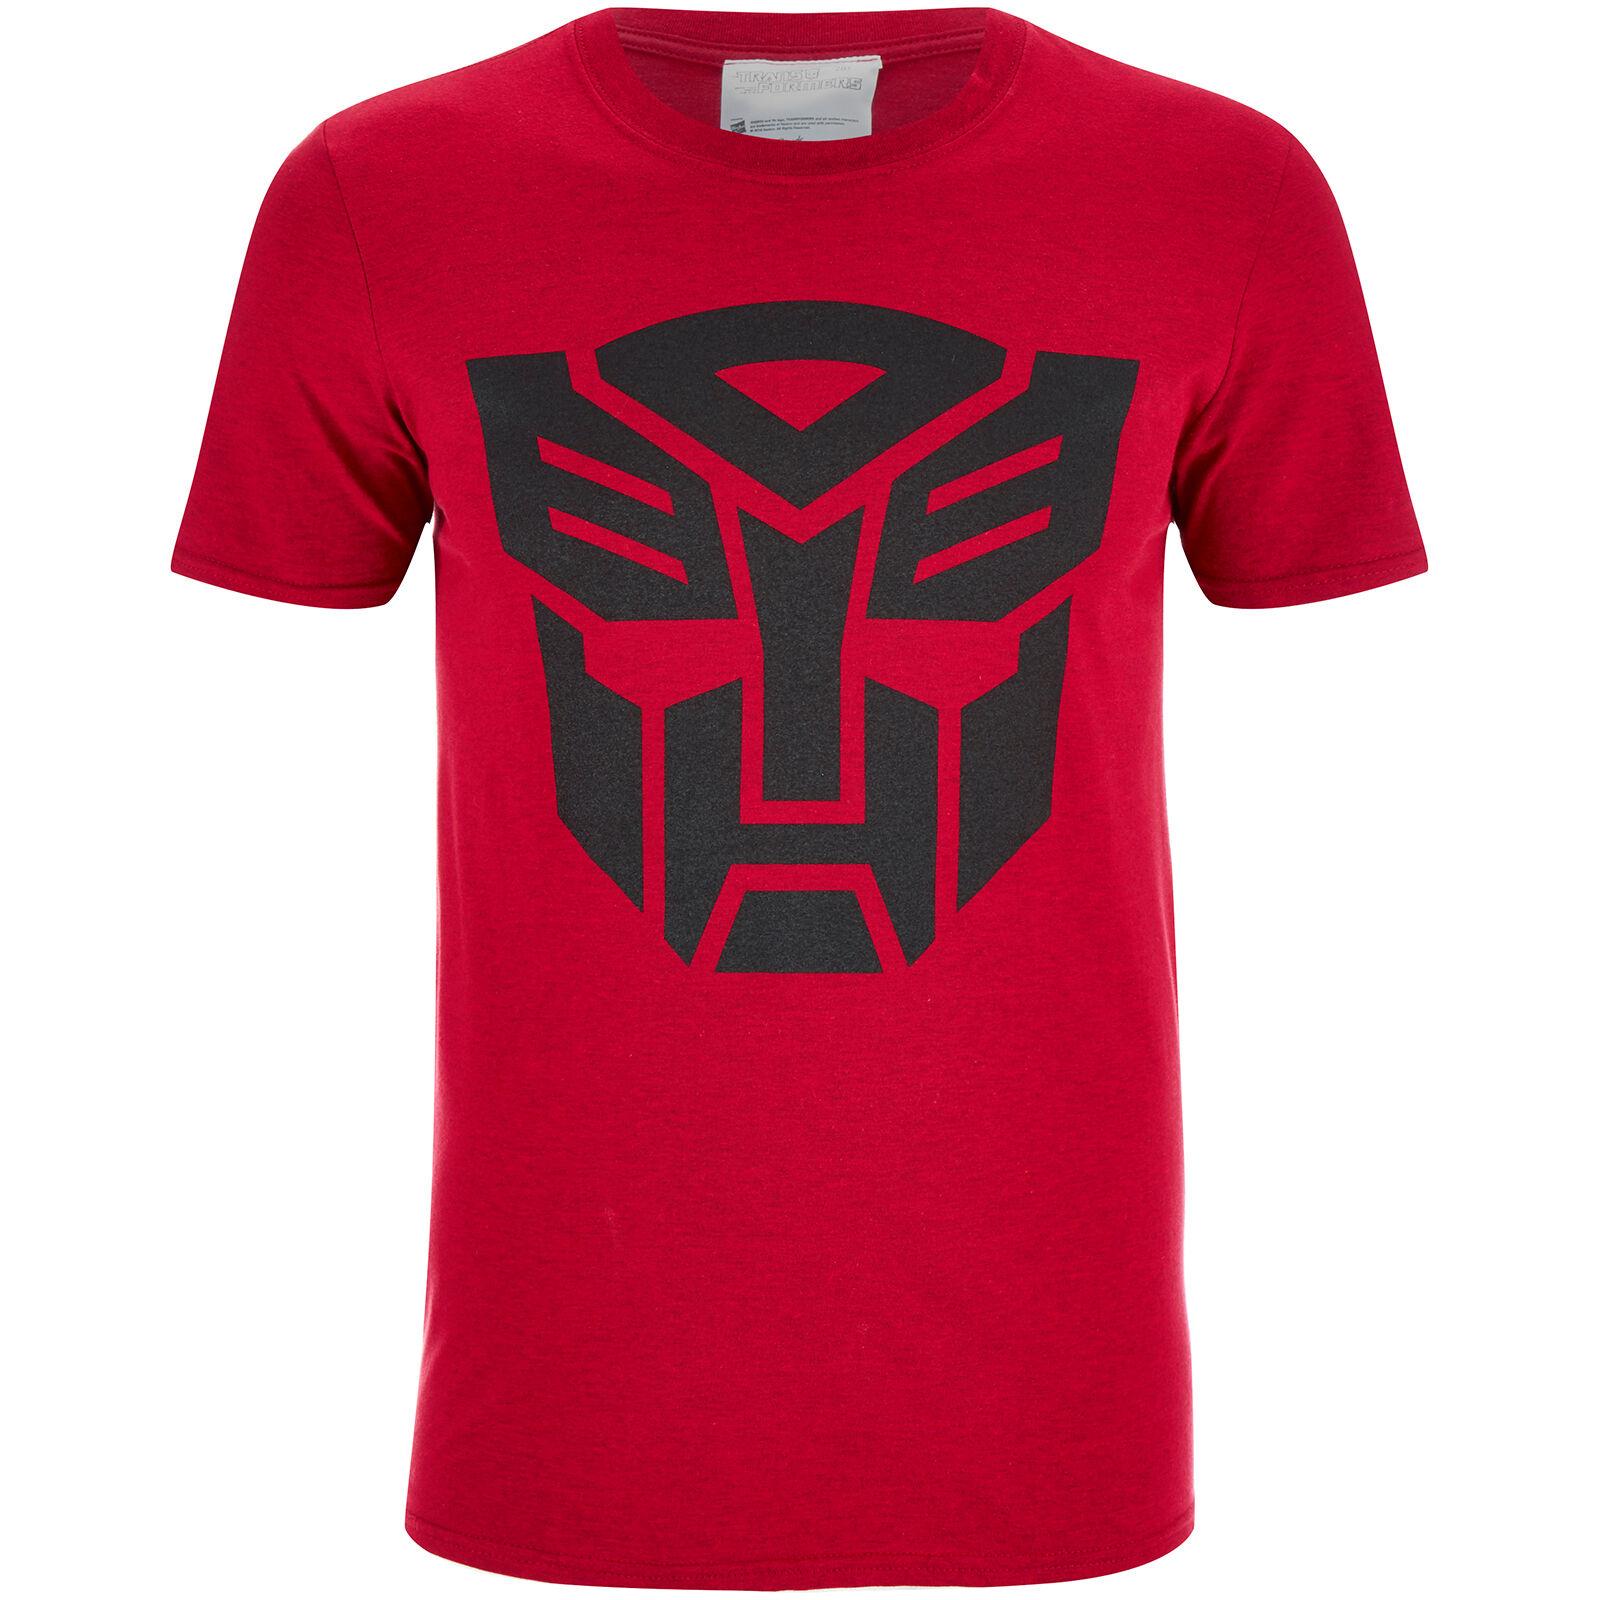 Geek Clothing Transformers Men's Transformers Black Emblem T-Shirt - Red - XL - Red